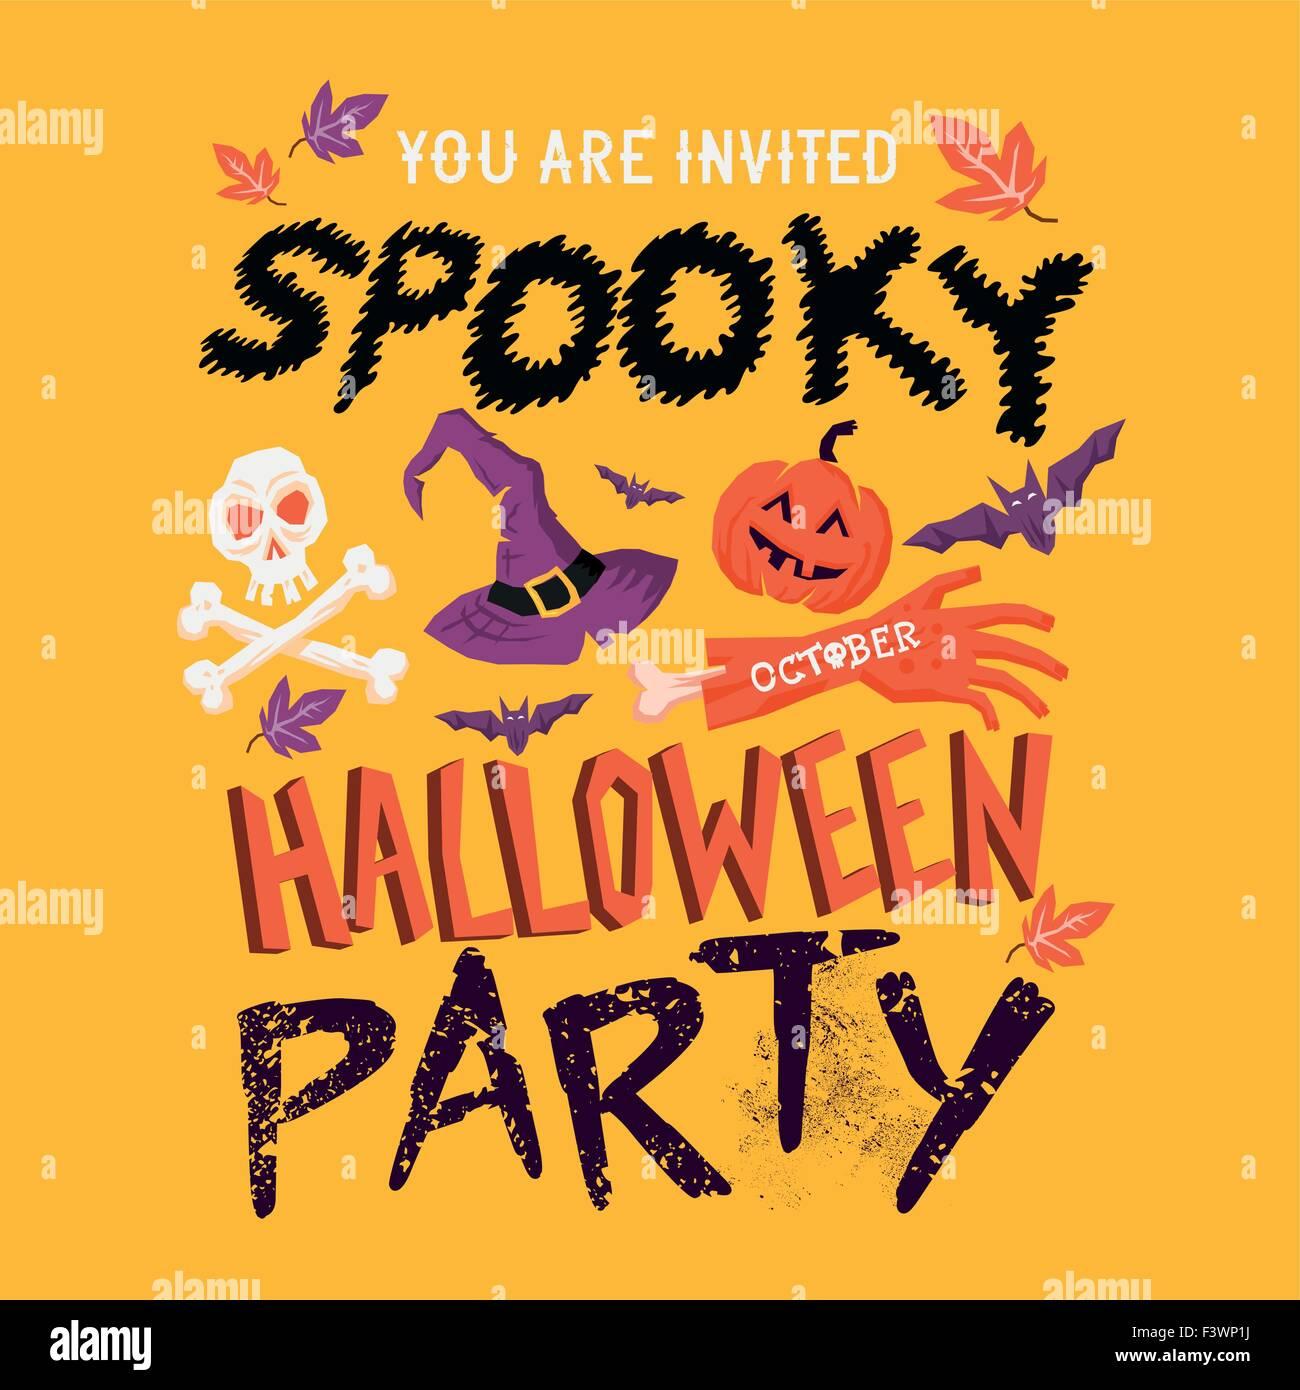 Spooky Halloween party poster design. Joyeux Halloween! Vector illustration Photo Stock